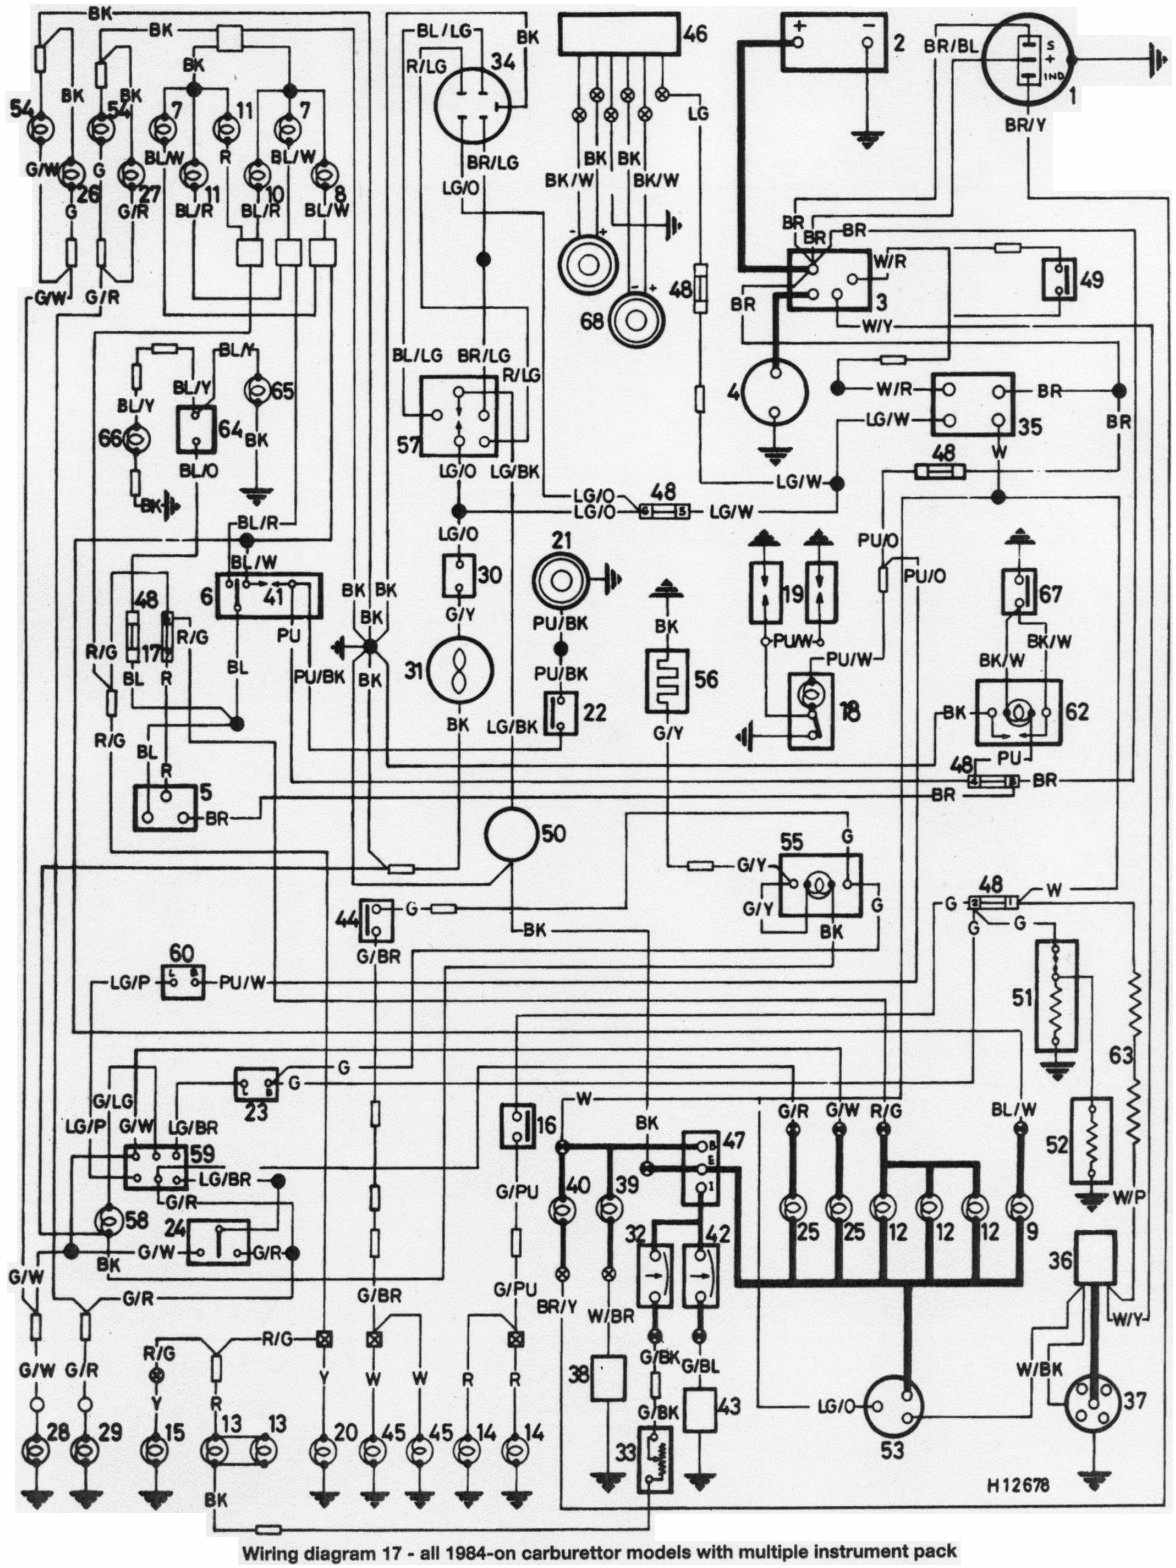 Mini Car Pdf Manual Wiring Diagram Fault Codes Dtc